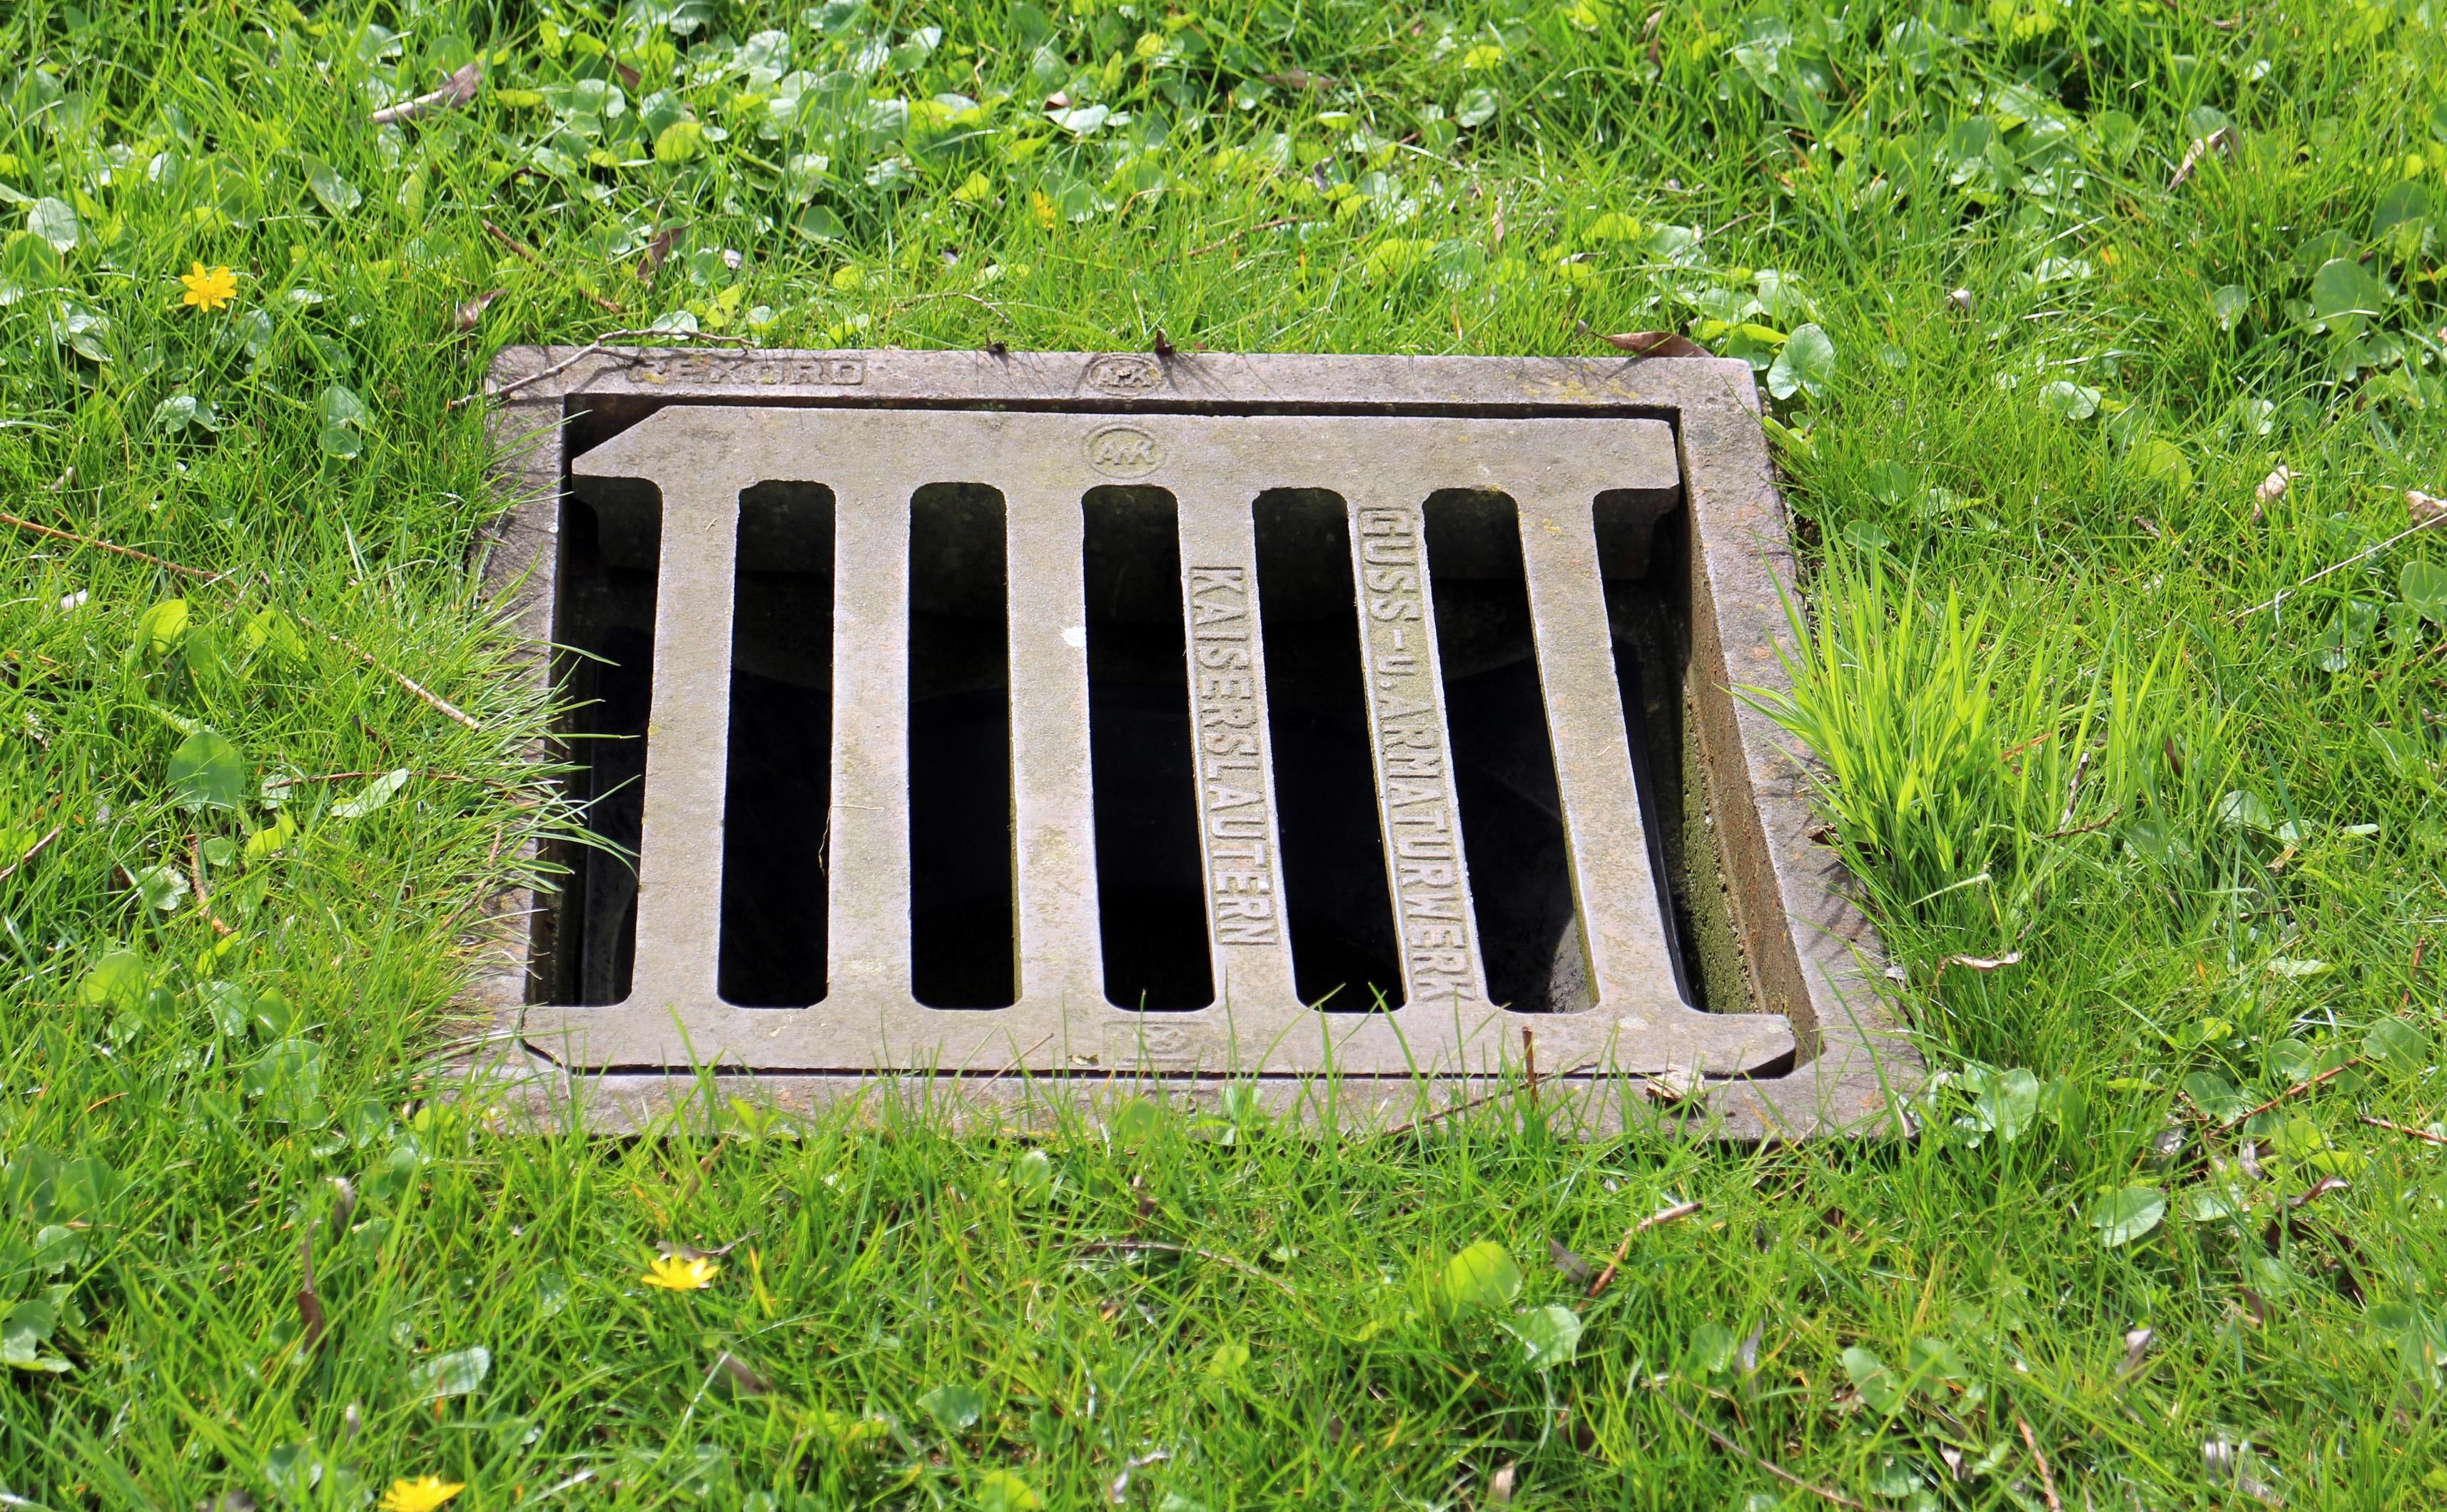 Grass Lawn Backyard Garden Channel Yard Manhole Covers Sewage System  Wastewater Gullideckel Gulli